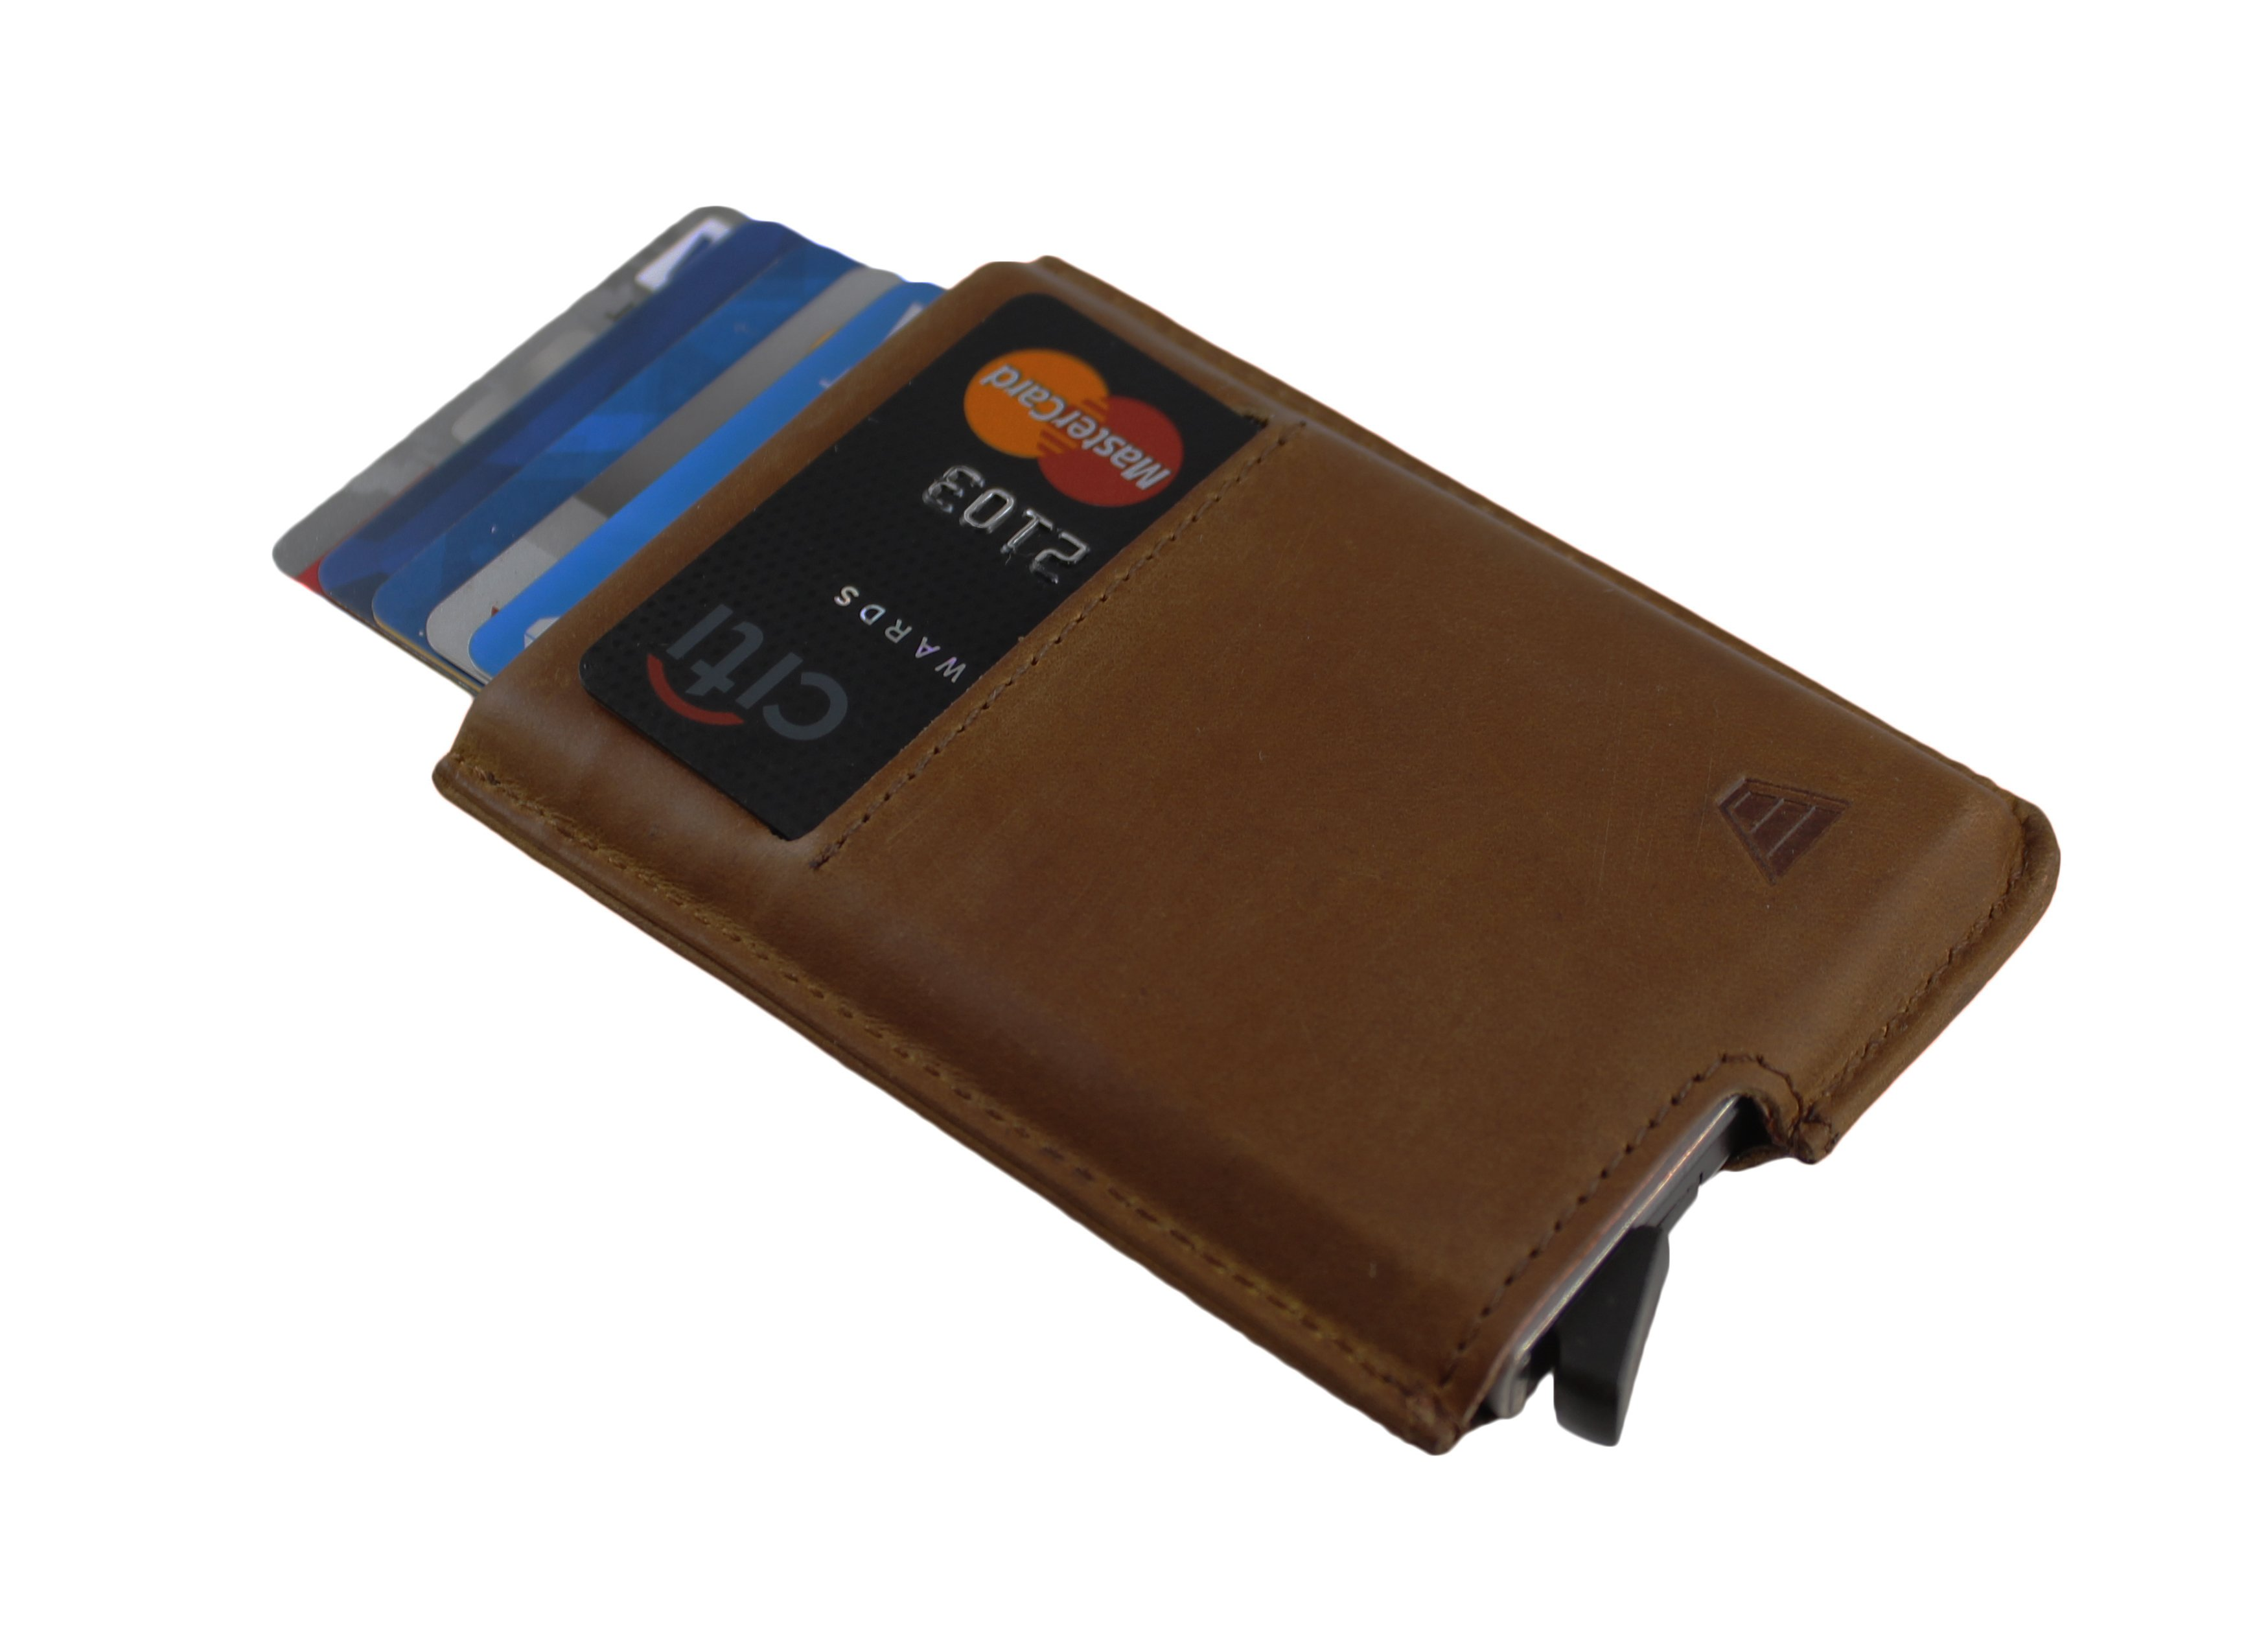 The Pilot – Andar Wallets